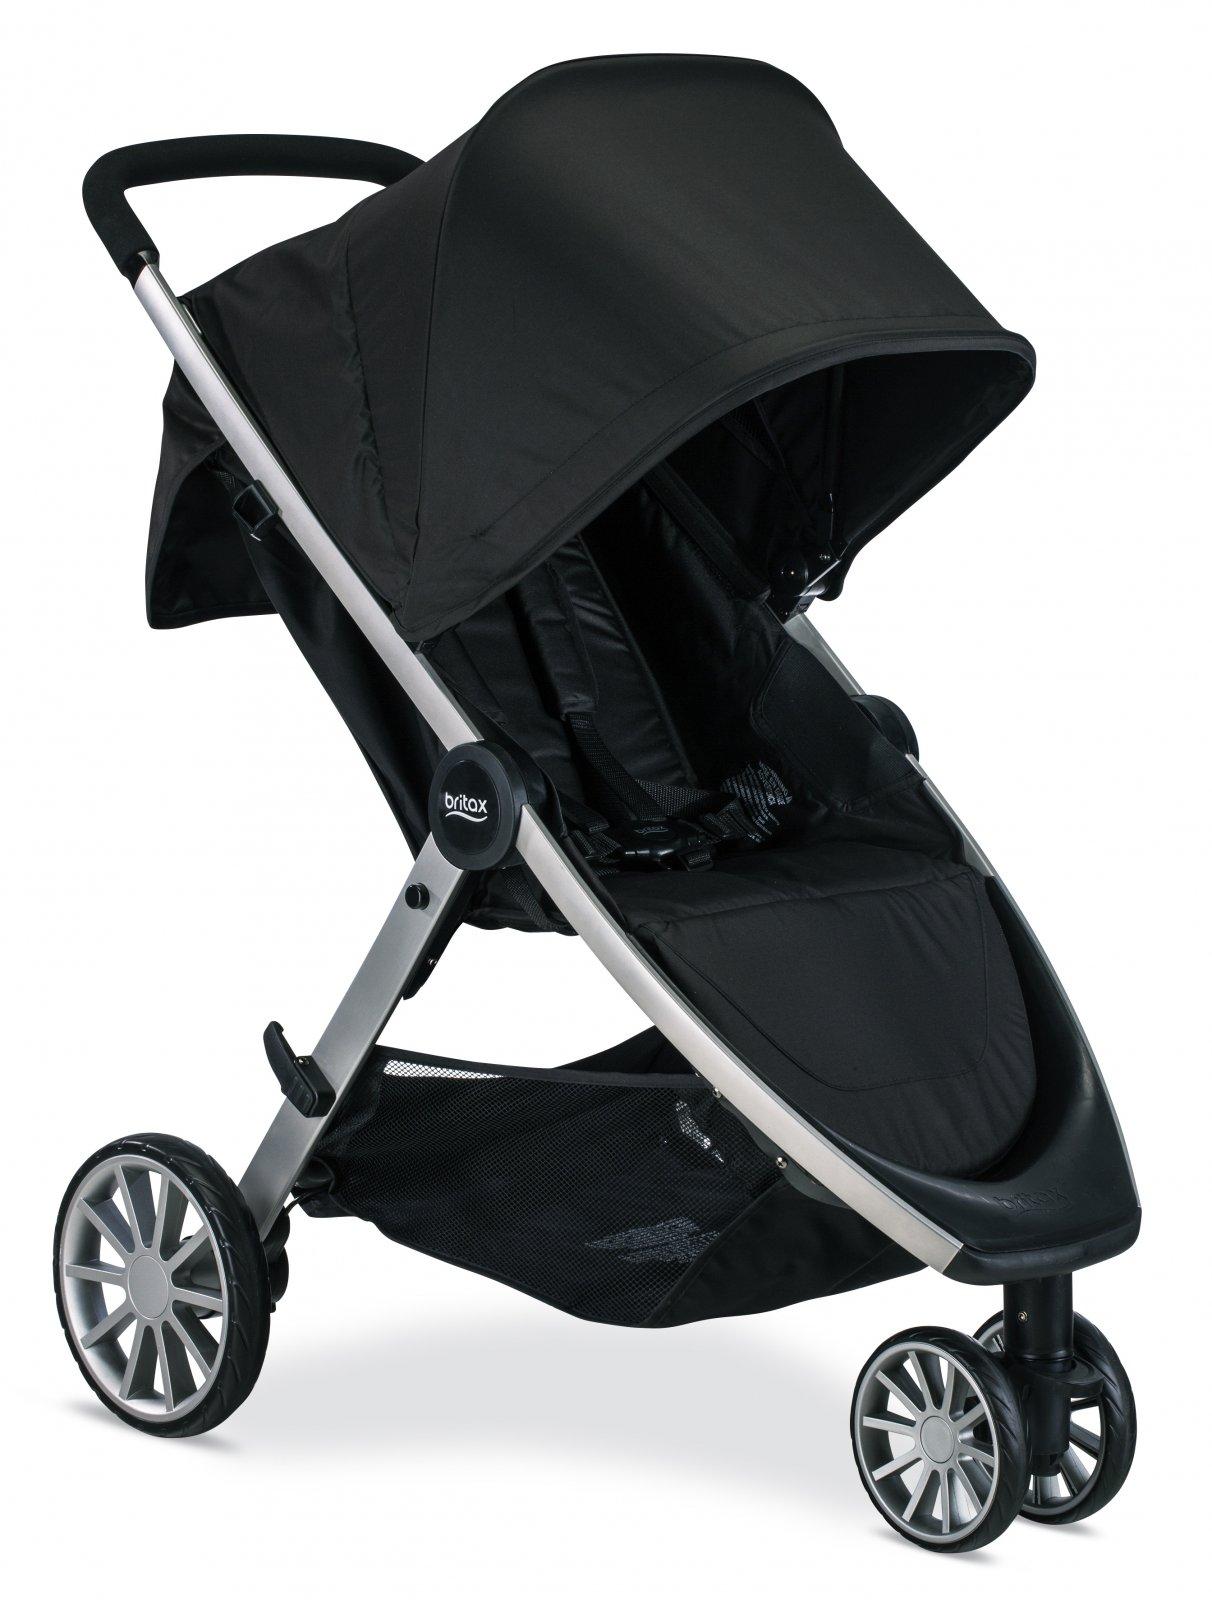 Britax B-Lively Stroller